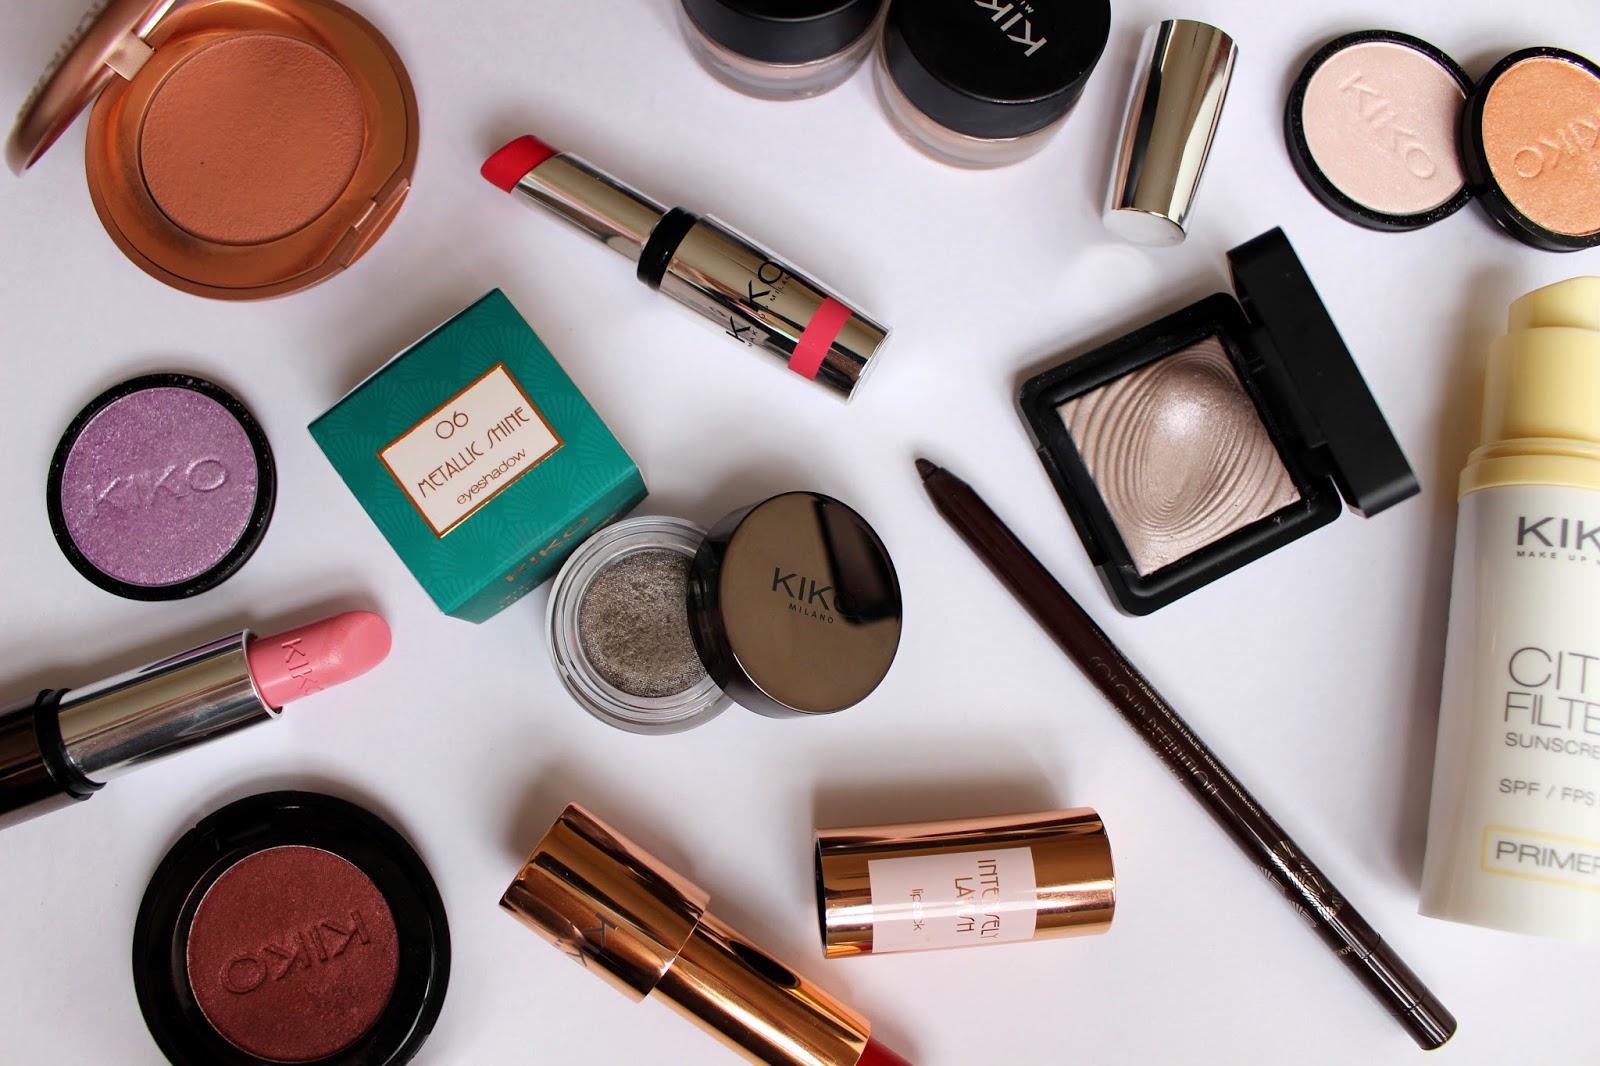 kiko makeup haul, brand overview of kiko cosmetics, makeup, flatlay photo